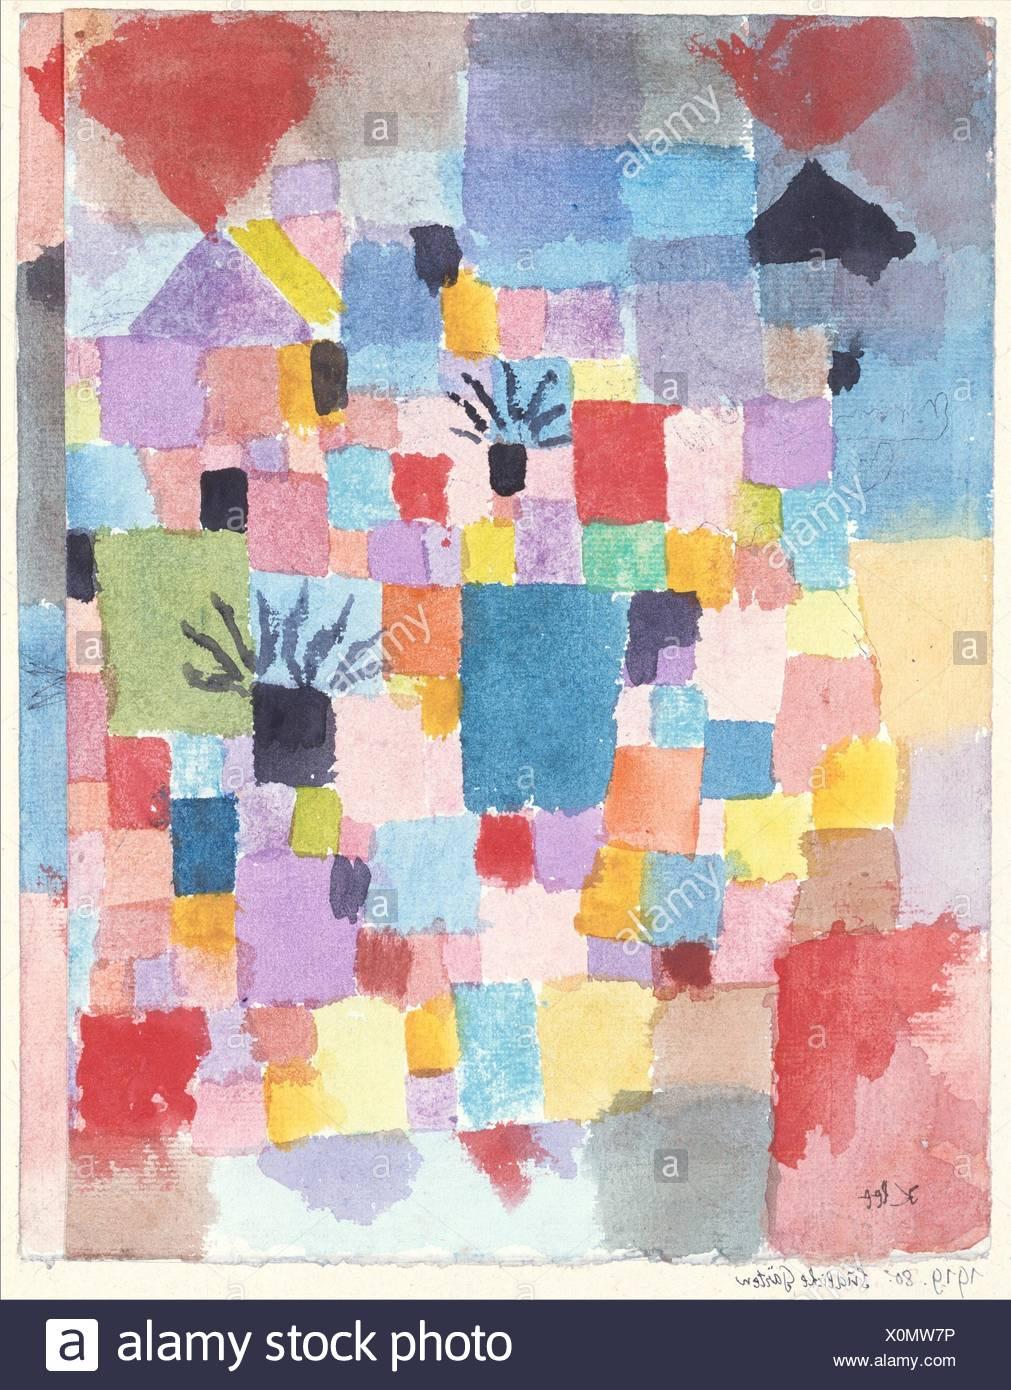 Southern Gardens. Artist: Paul Klee (German (born Switzerland), Münchenbuchsee 1879-1940 Muralto-Locarno); Date: 1919; Medium: Watercolor and ink on - Stock Image